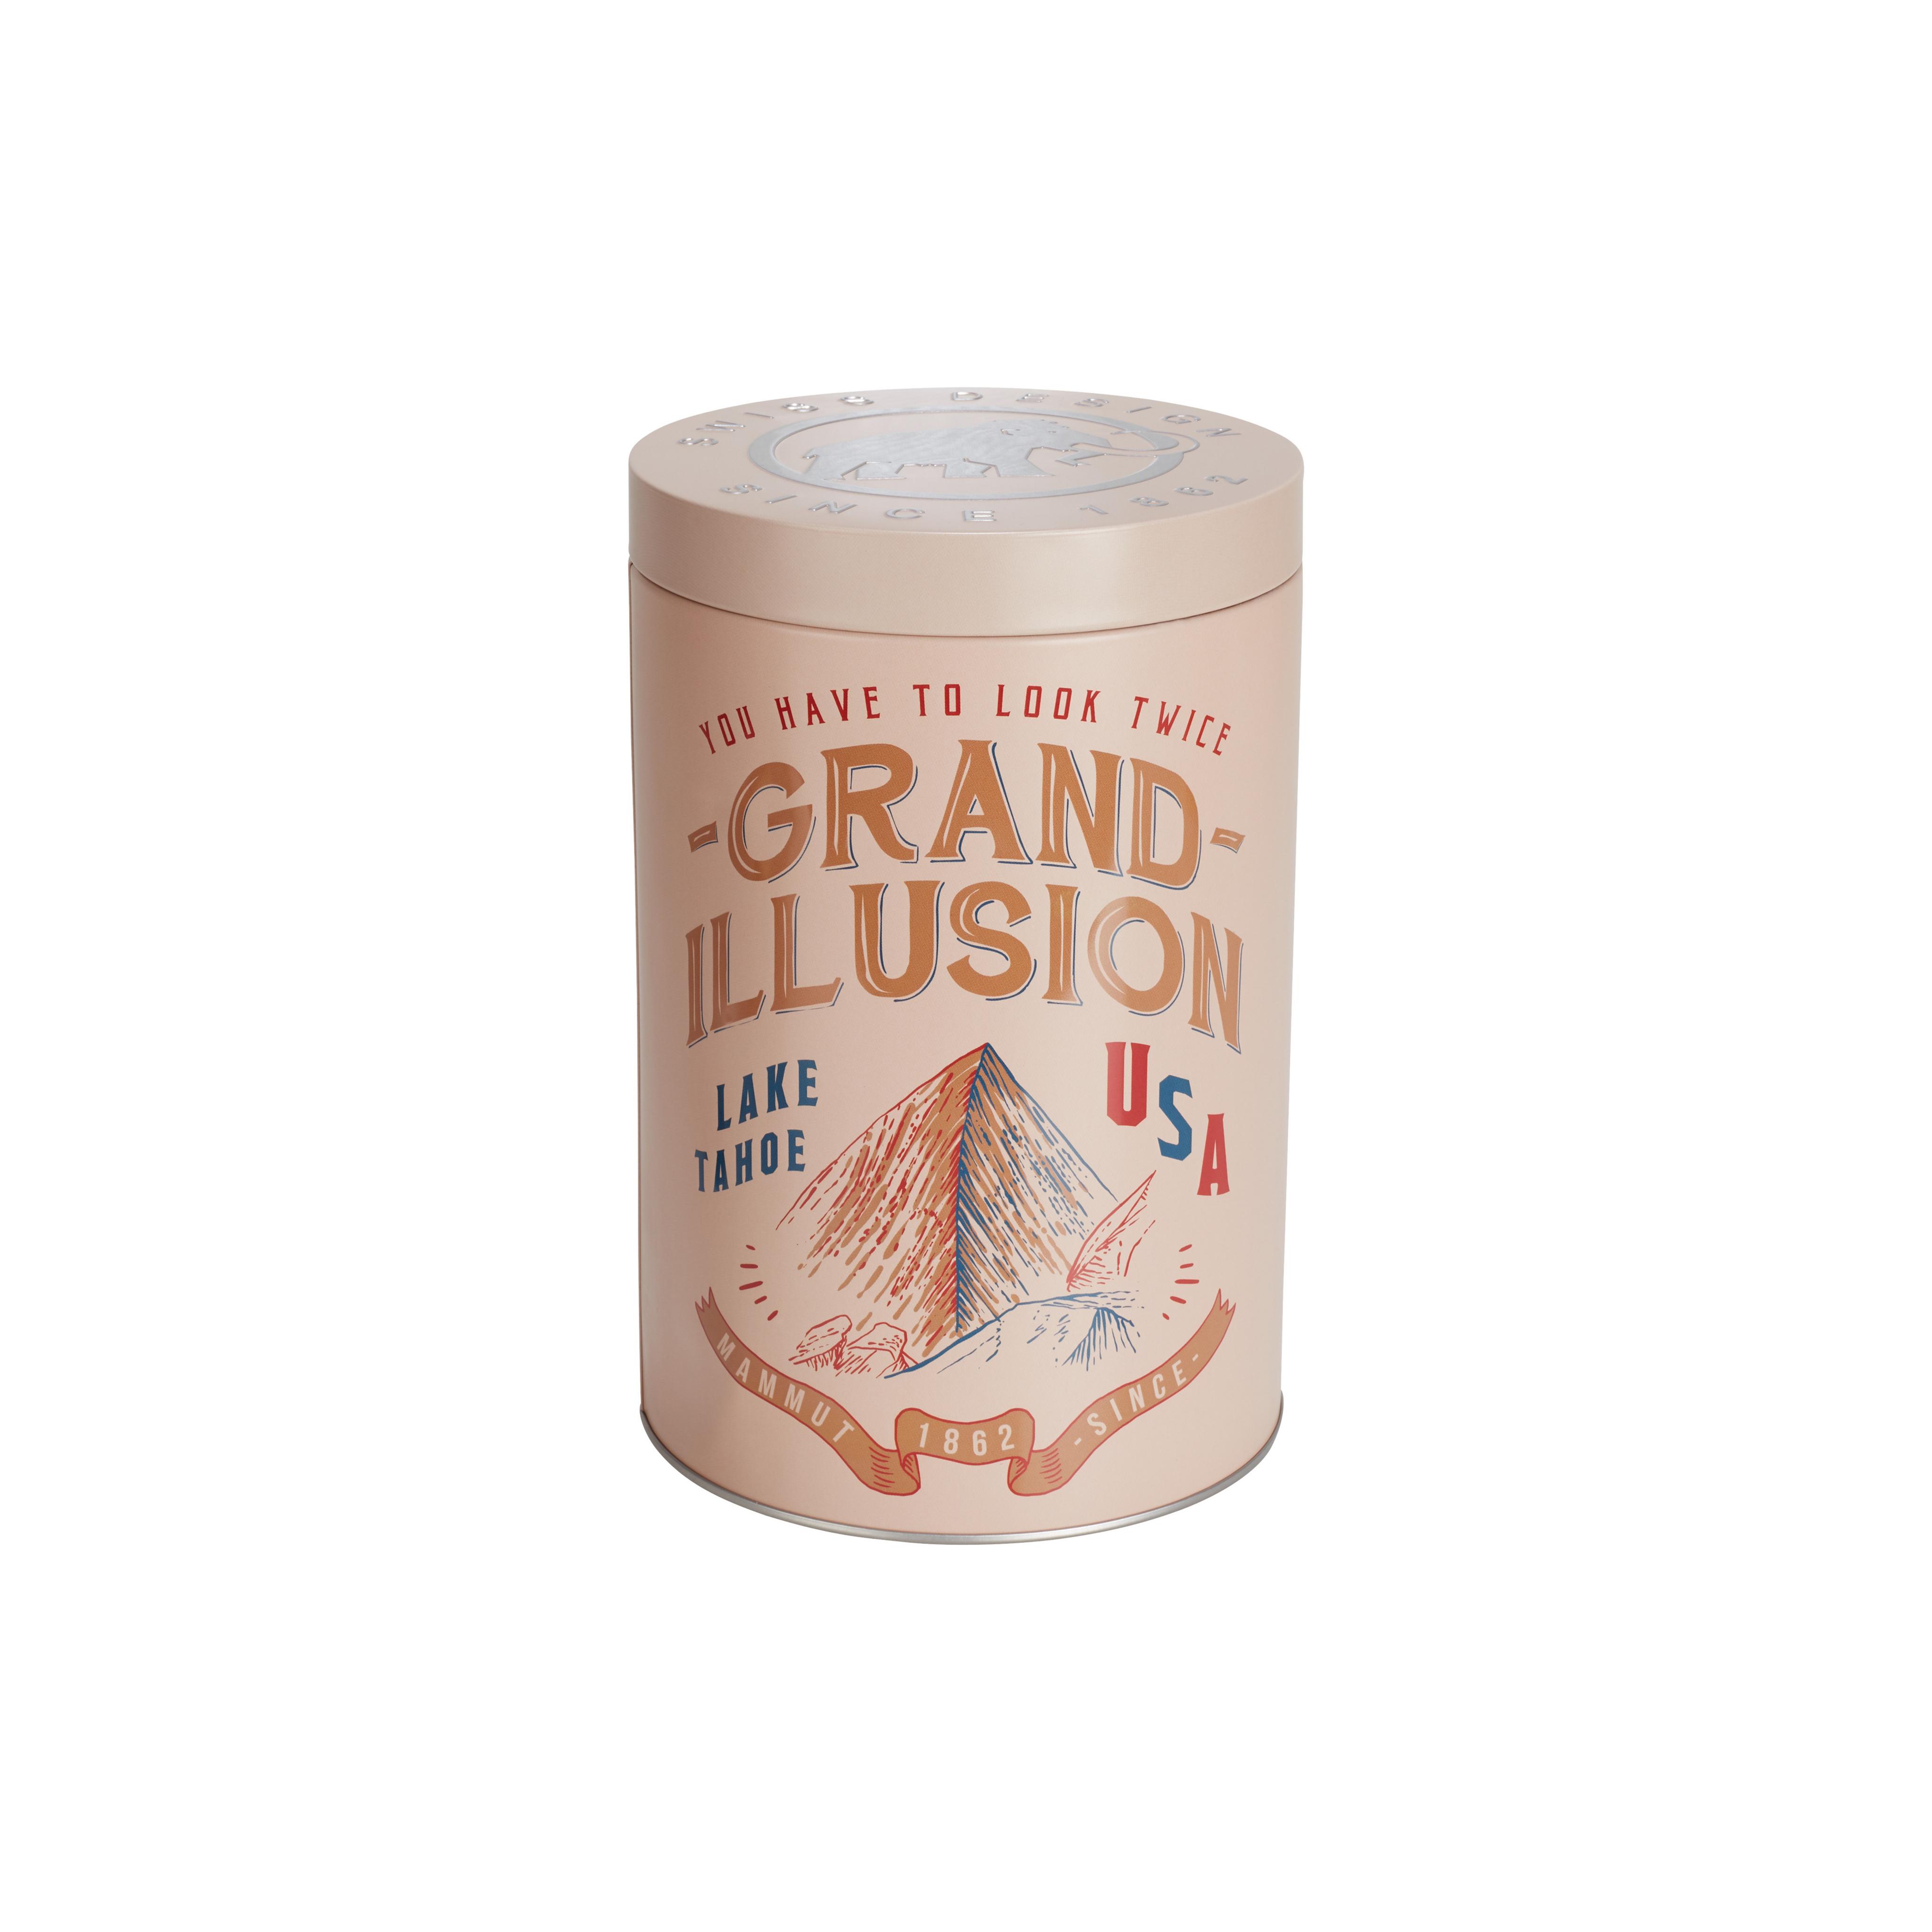 Pure Chalk Collectors Box - grand illusion, one size product image